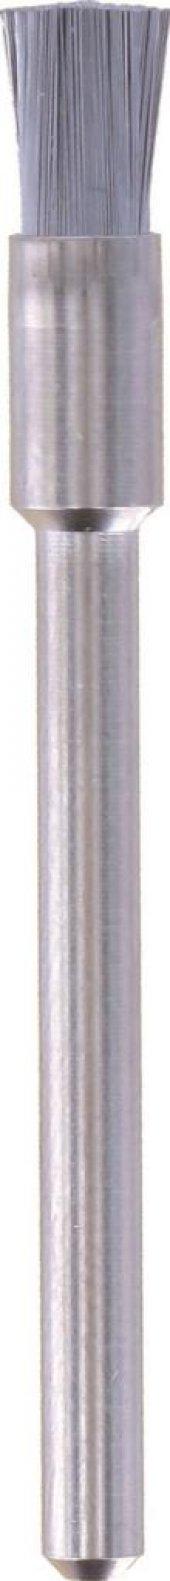 Dremel Karbon Çelik Fırça 3,2 Mm (443) (3 Adet)...